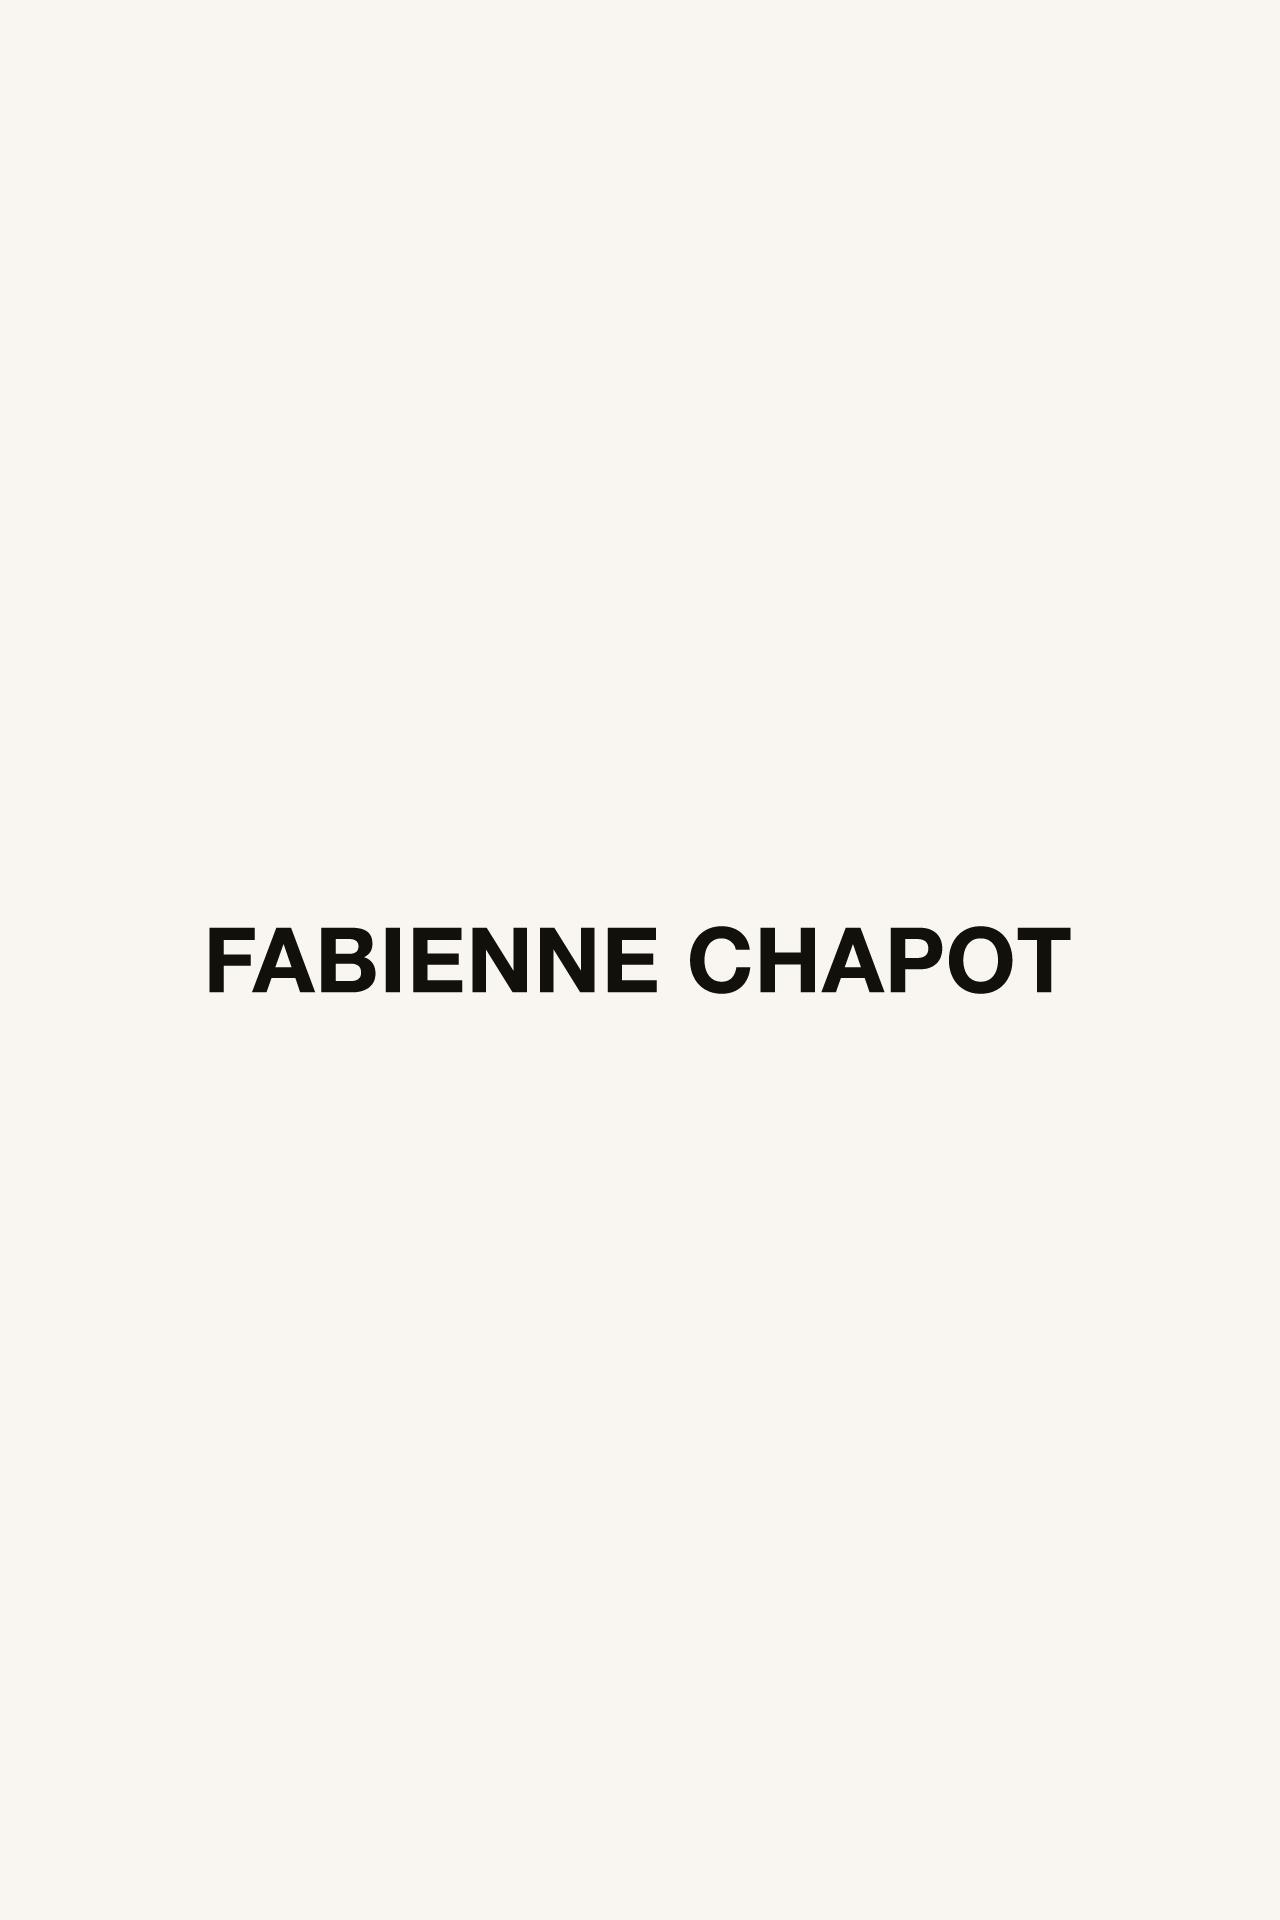 FC Hat Emerald Green - Fabienne Chapot - The official webshop 65ba8e7f7d0